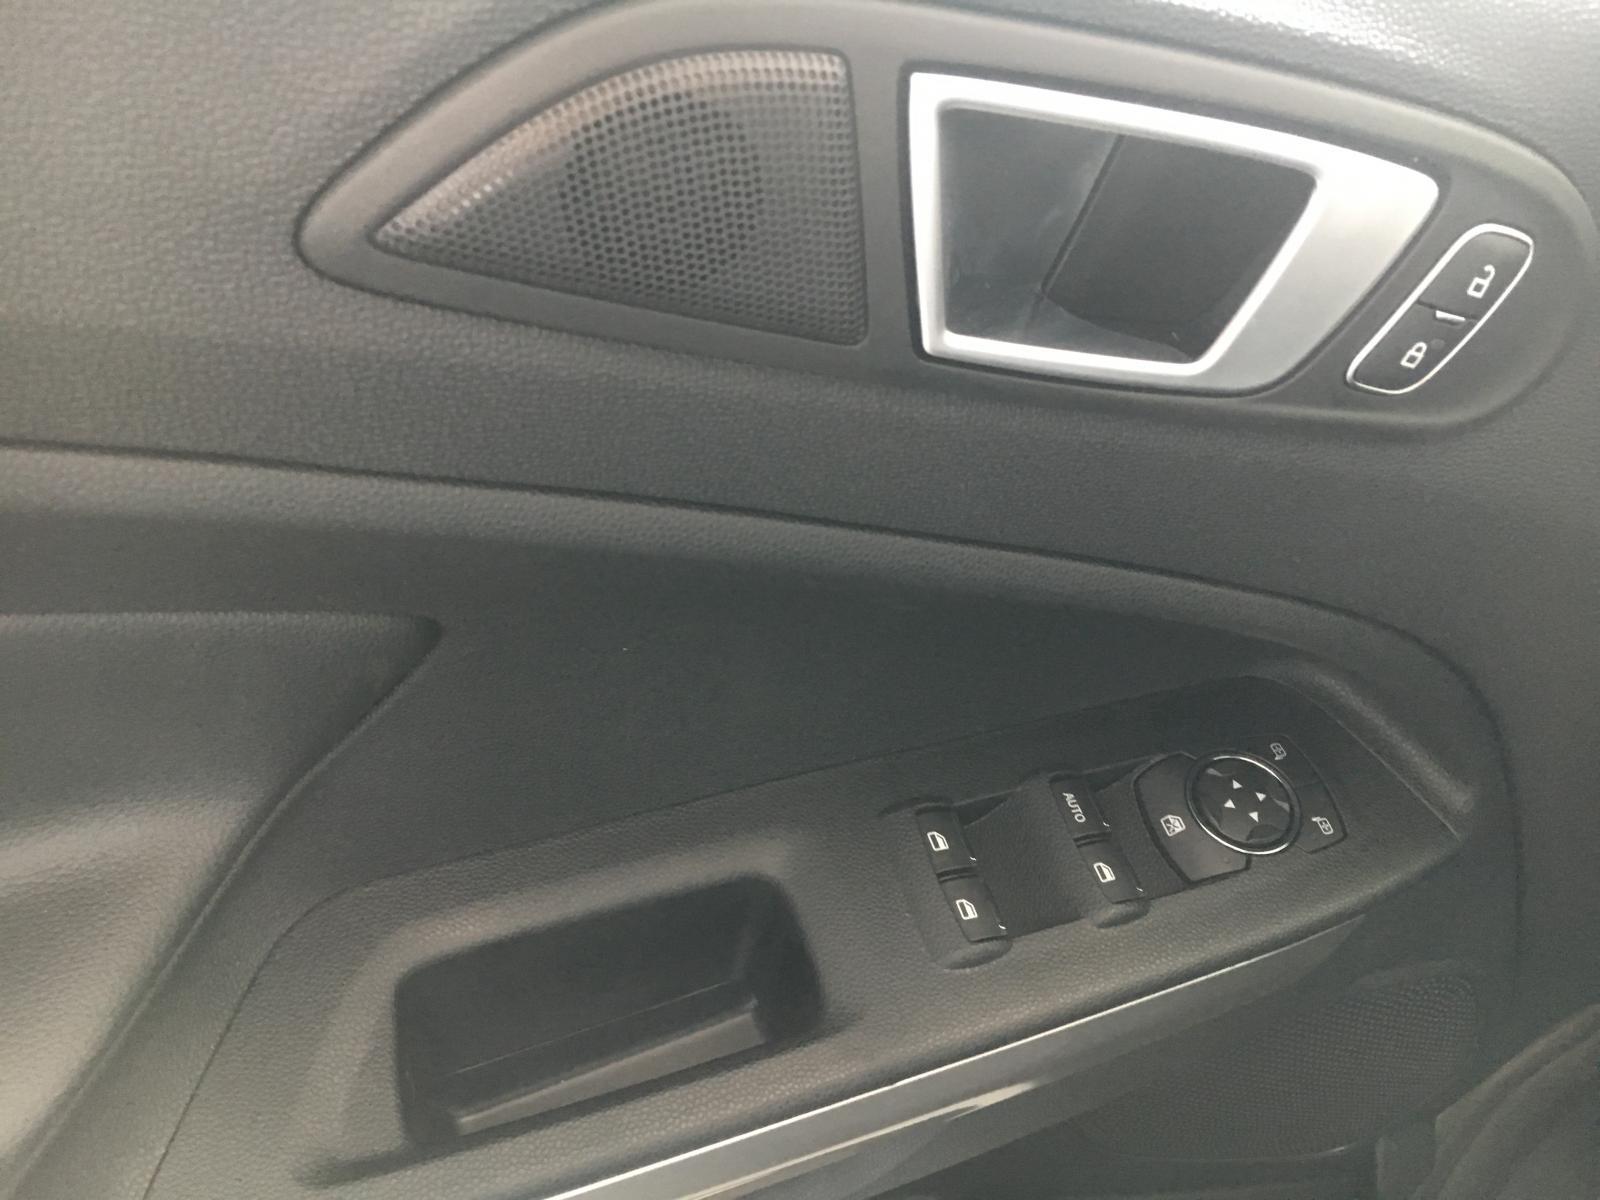 Bán Ecosport 1.5L Titanium, lô xe mới, đủ màu